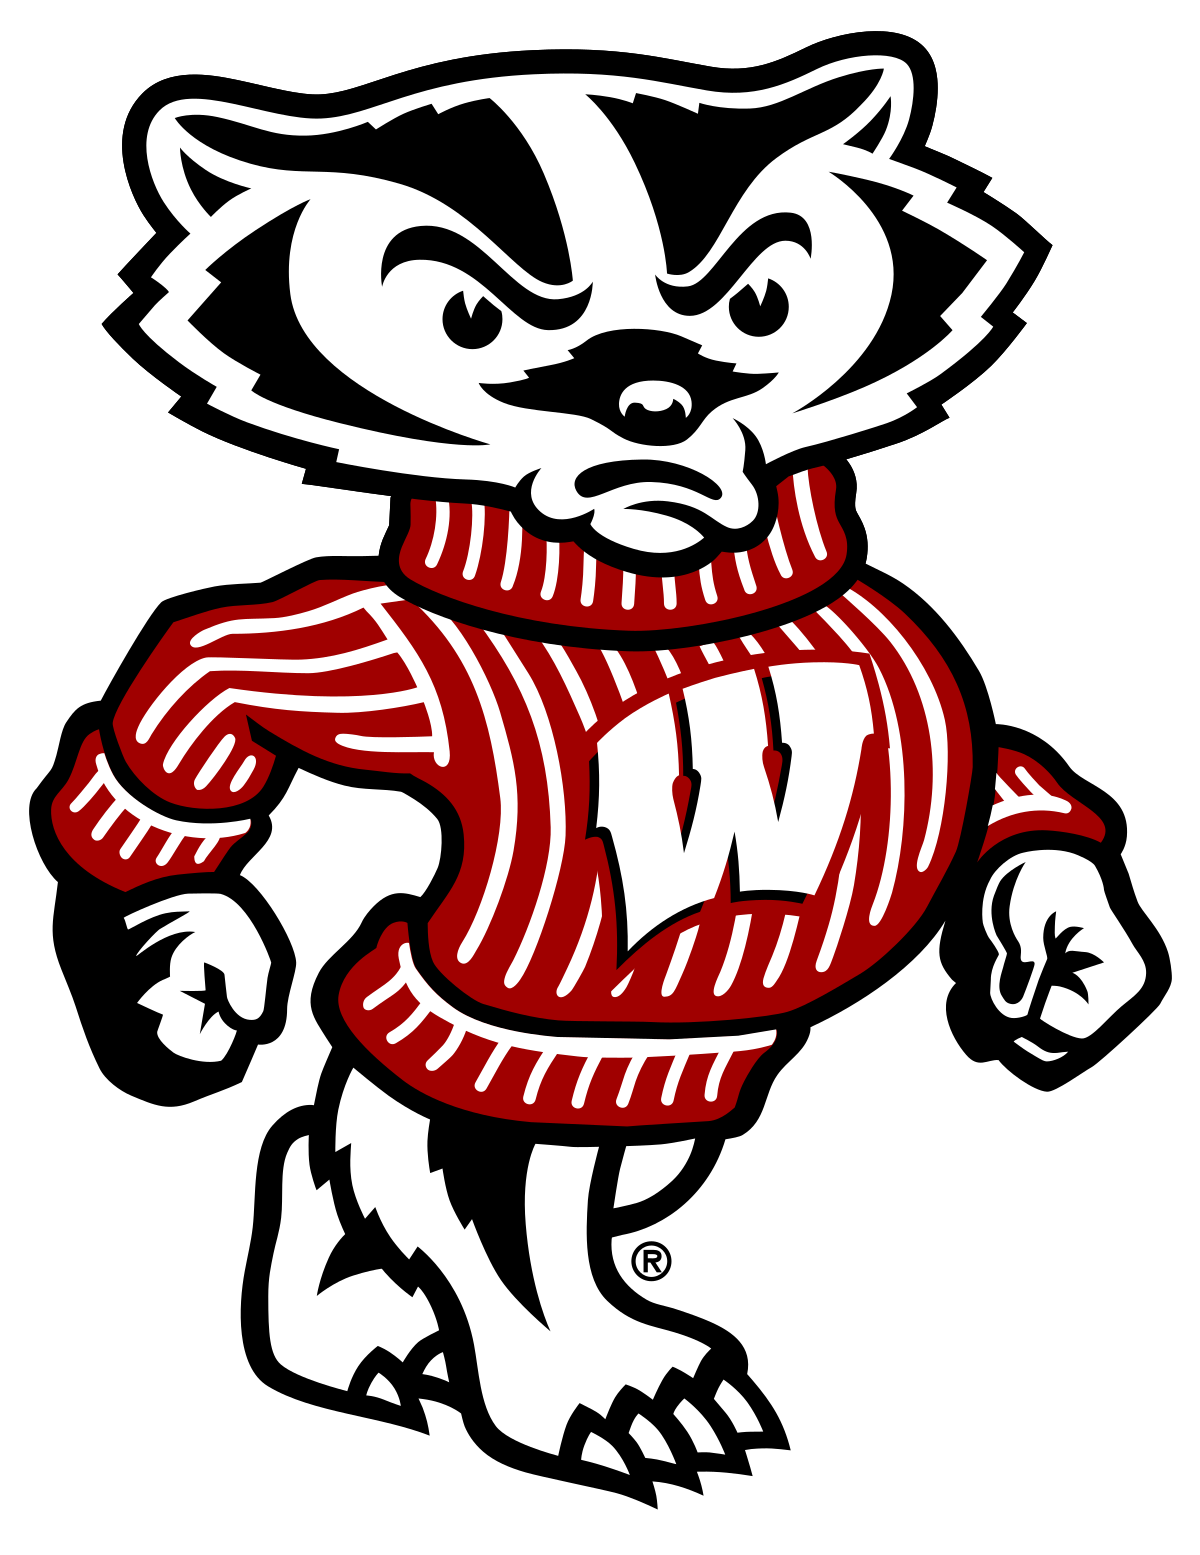 Badger clipart mascot Bucky Badger Wikipedia